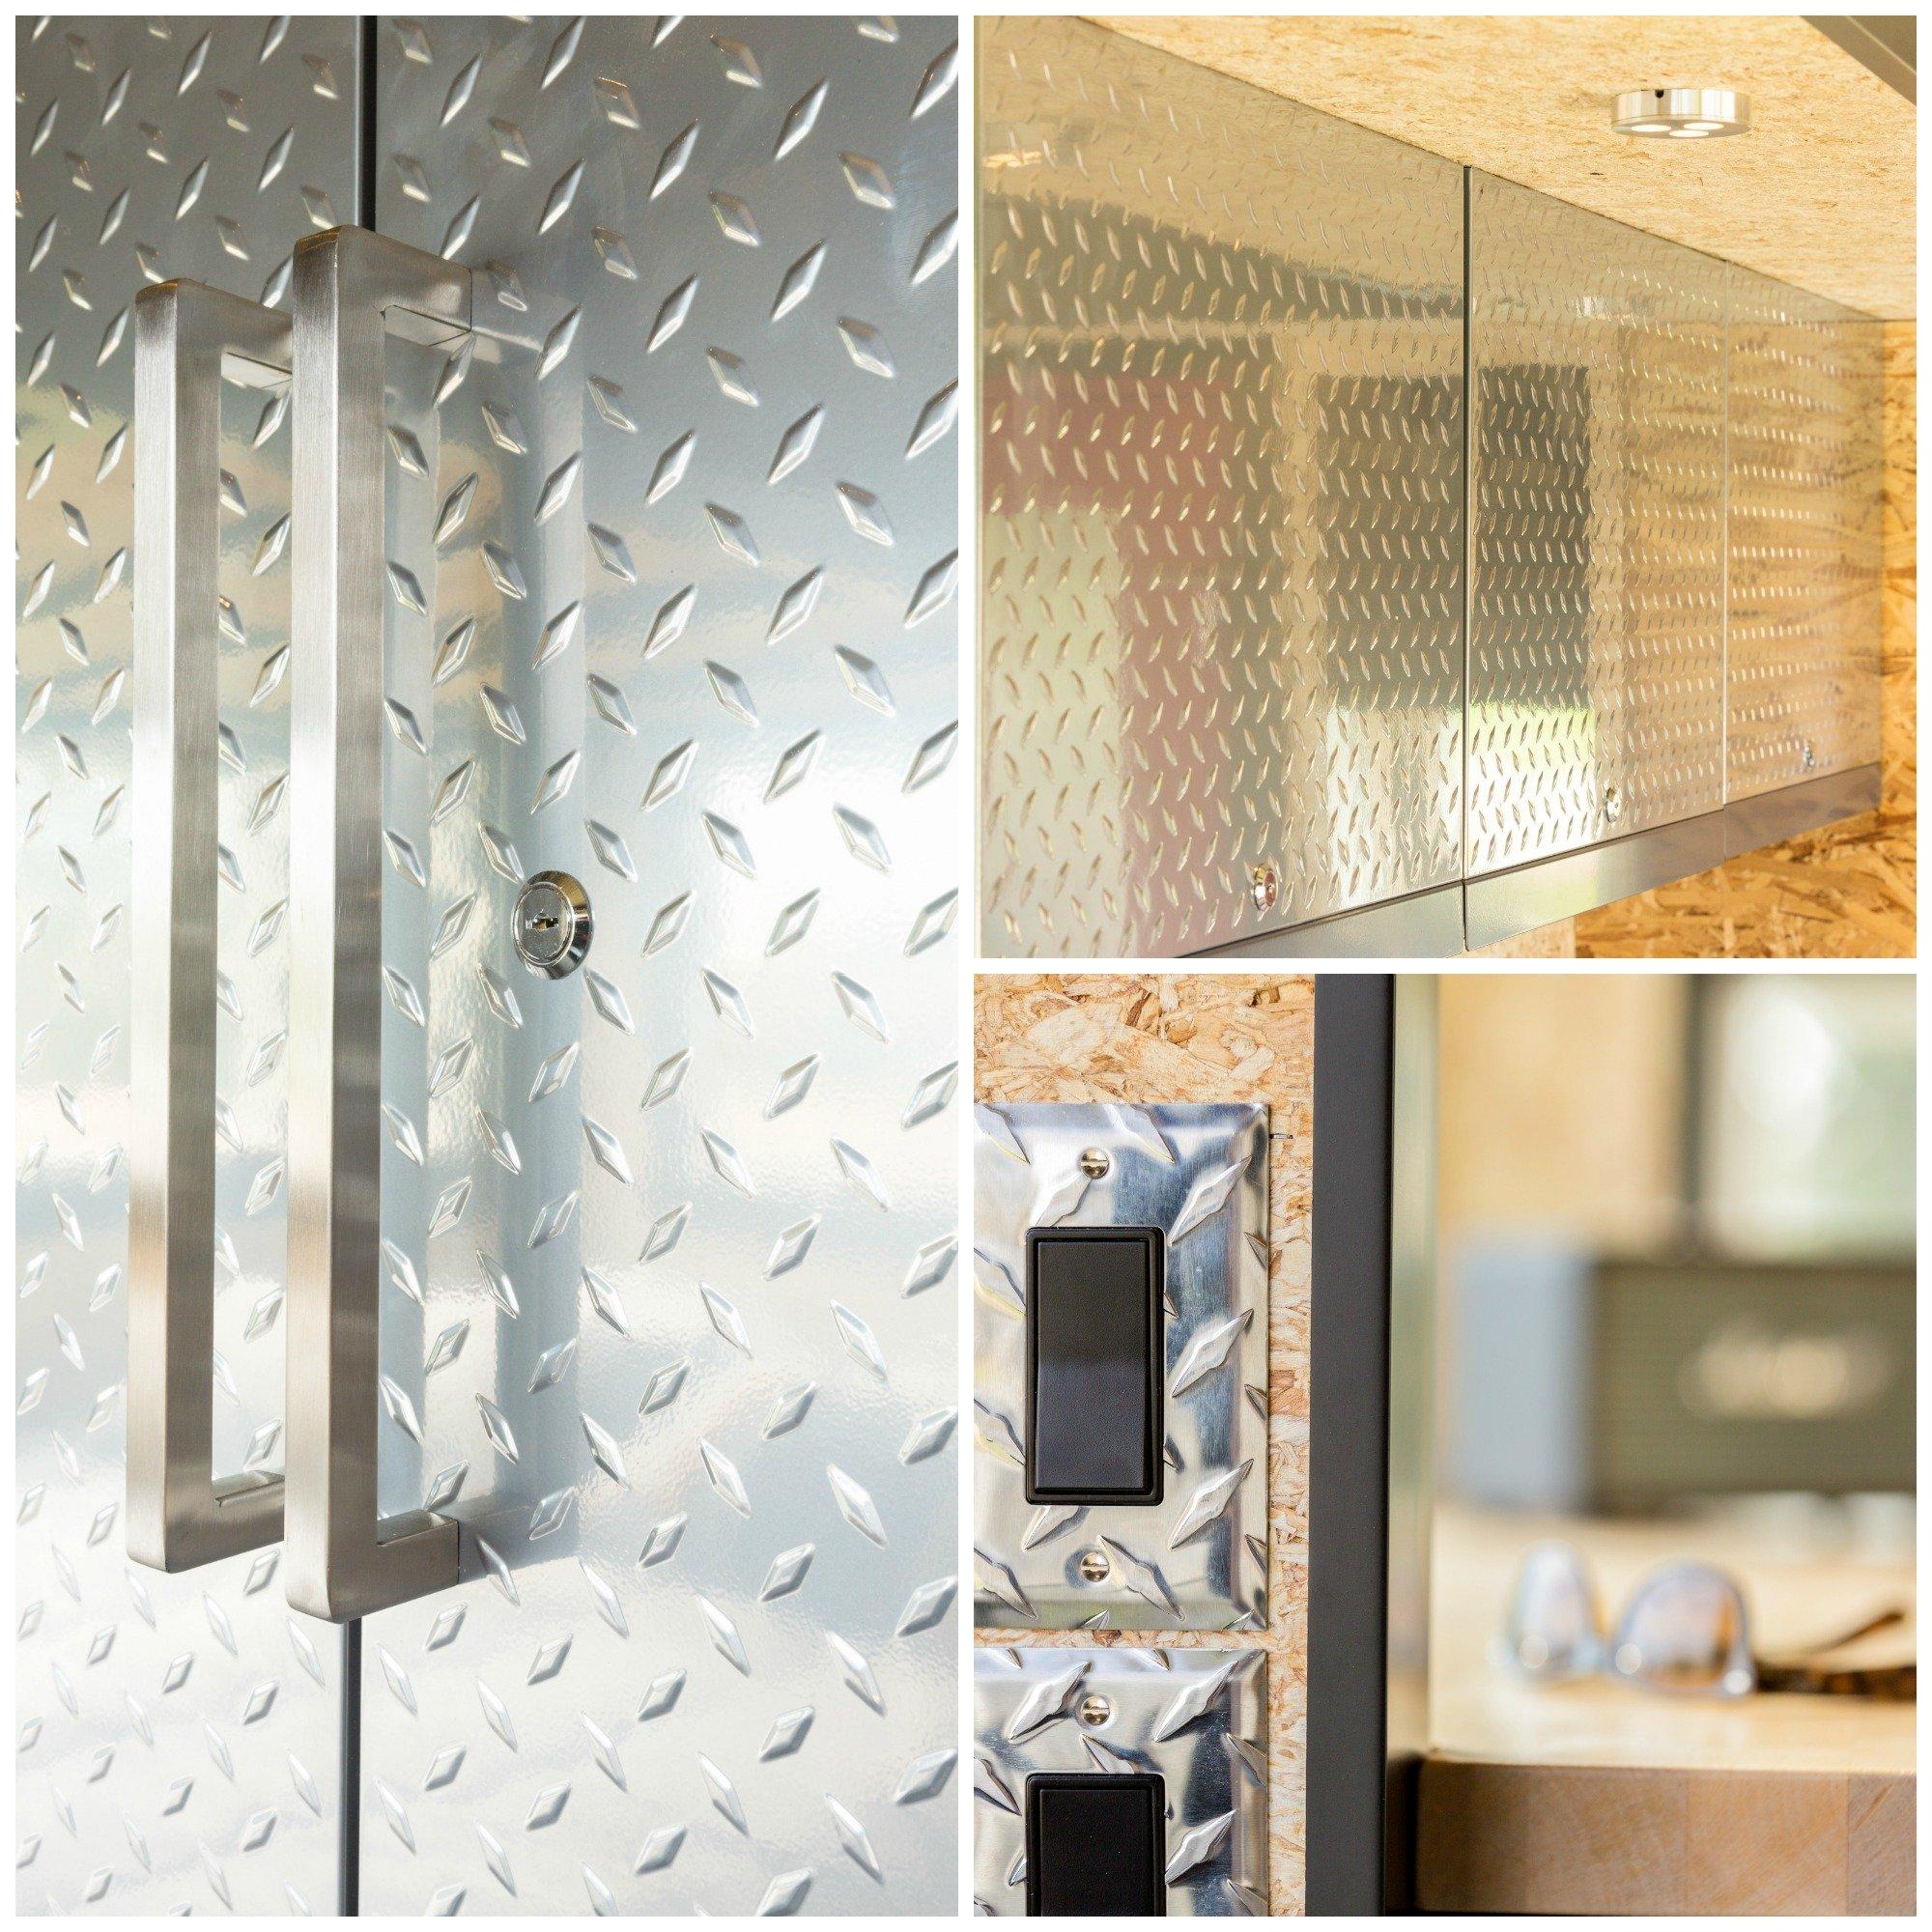 Diamond Plate Steel Storage, locking cabinets